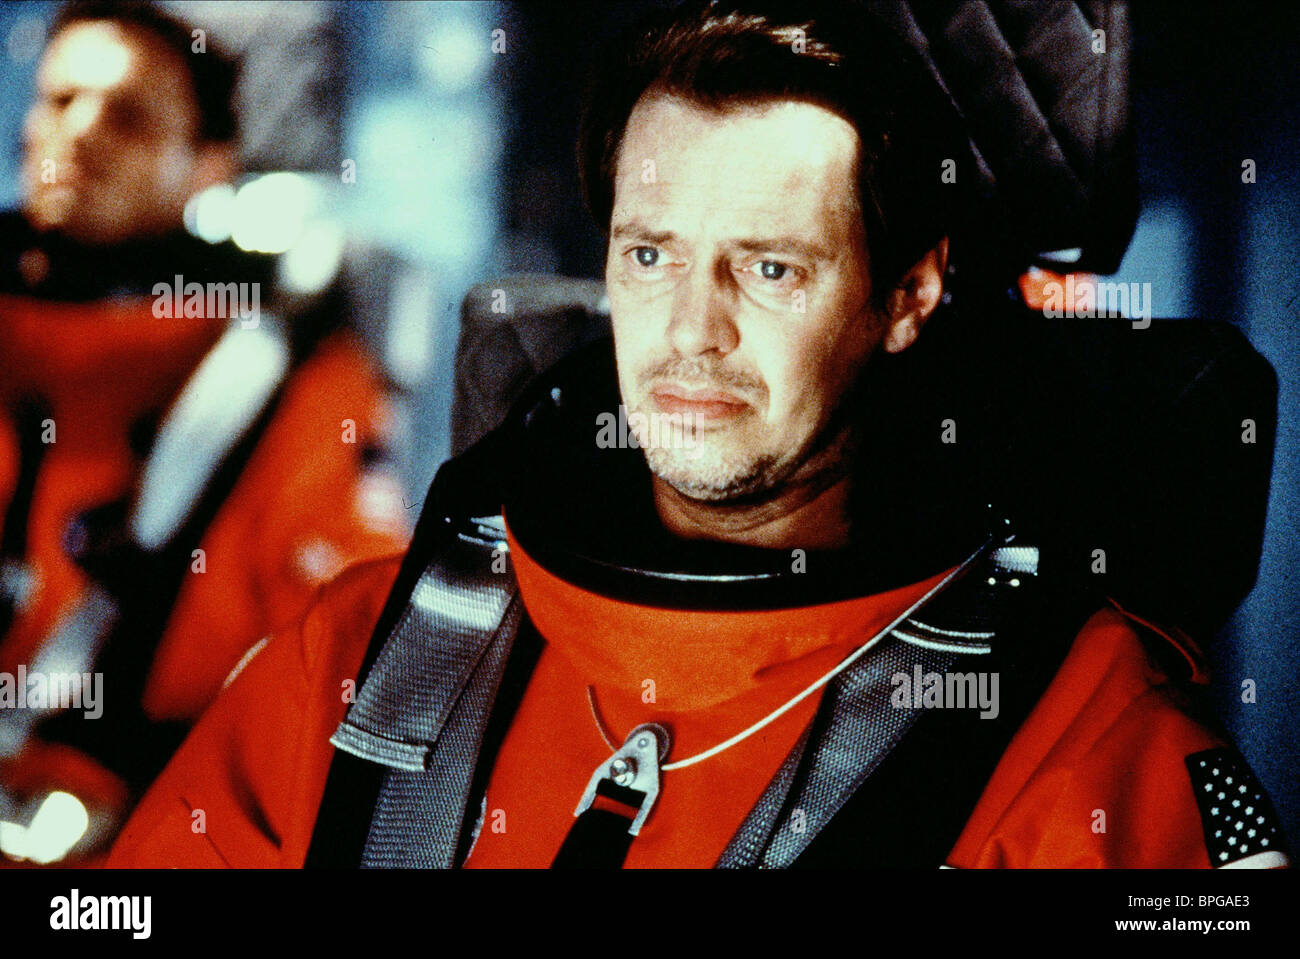 STEVE BUSCEMI ARMAGEDDON (1998) - Stock Image